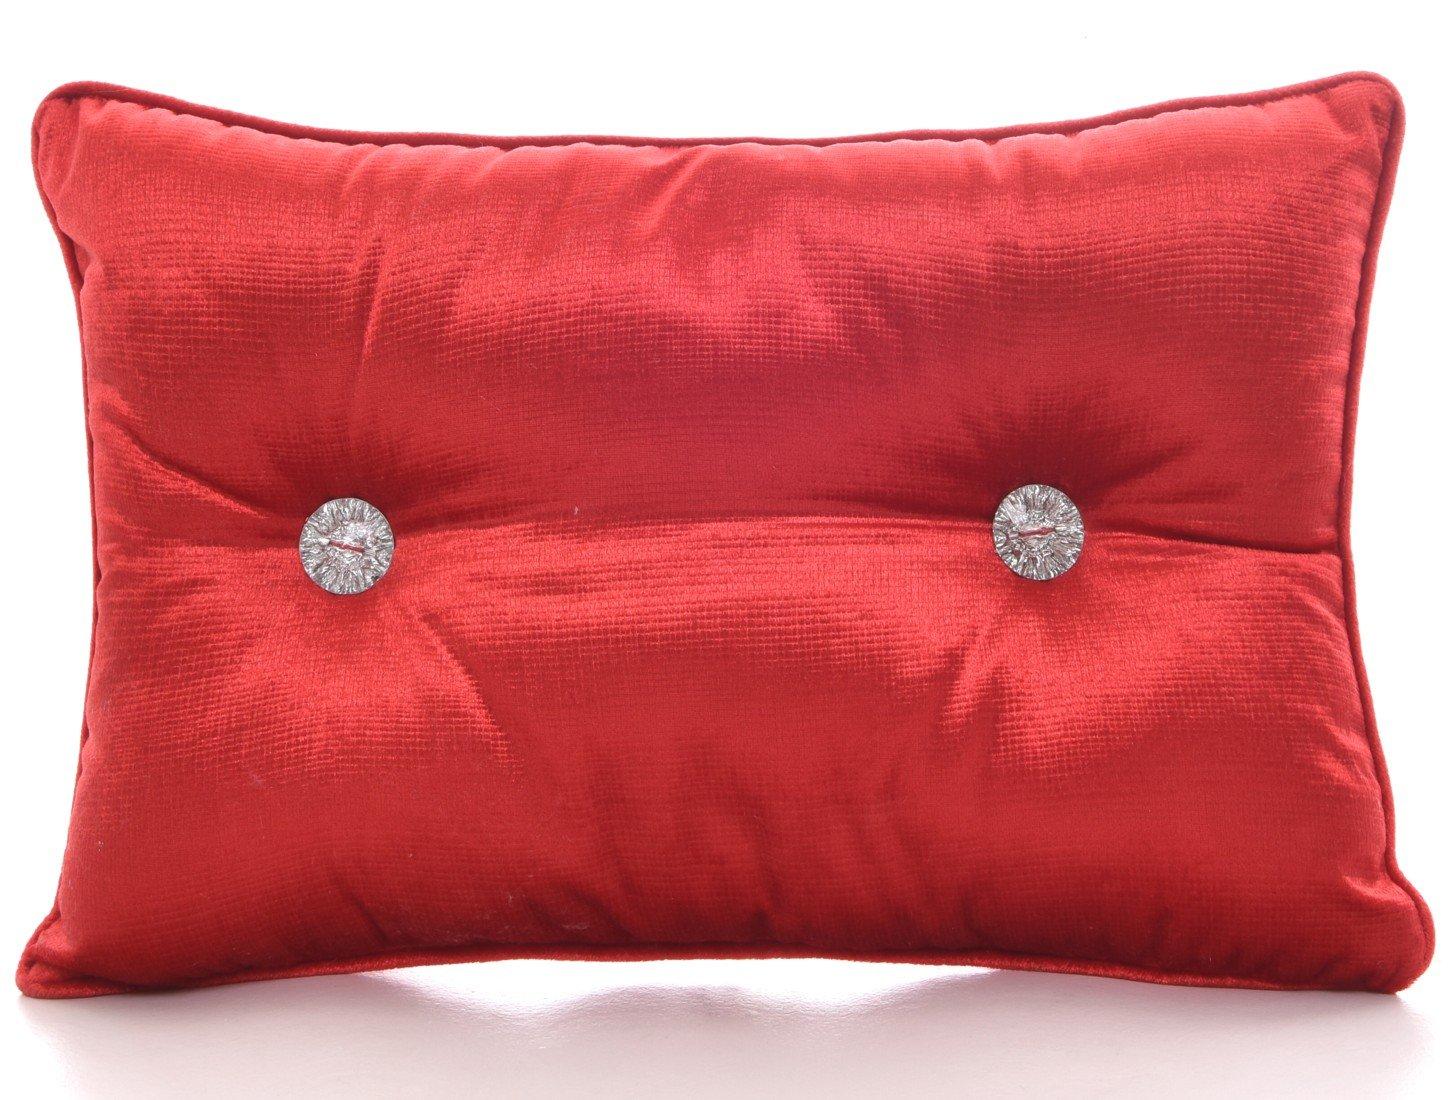 Chenille Boudoir Rectangular Diamante Filled Scatter Cushions Machine Washable